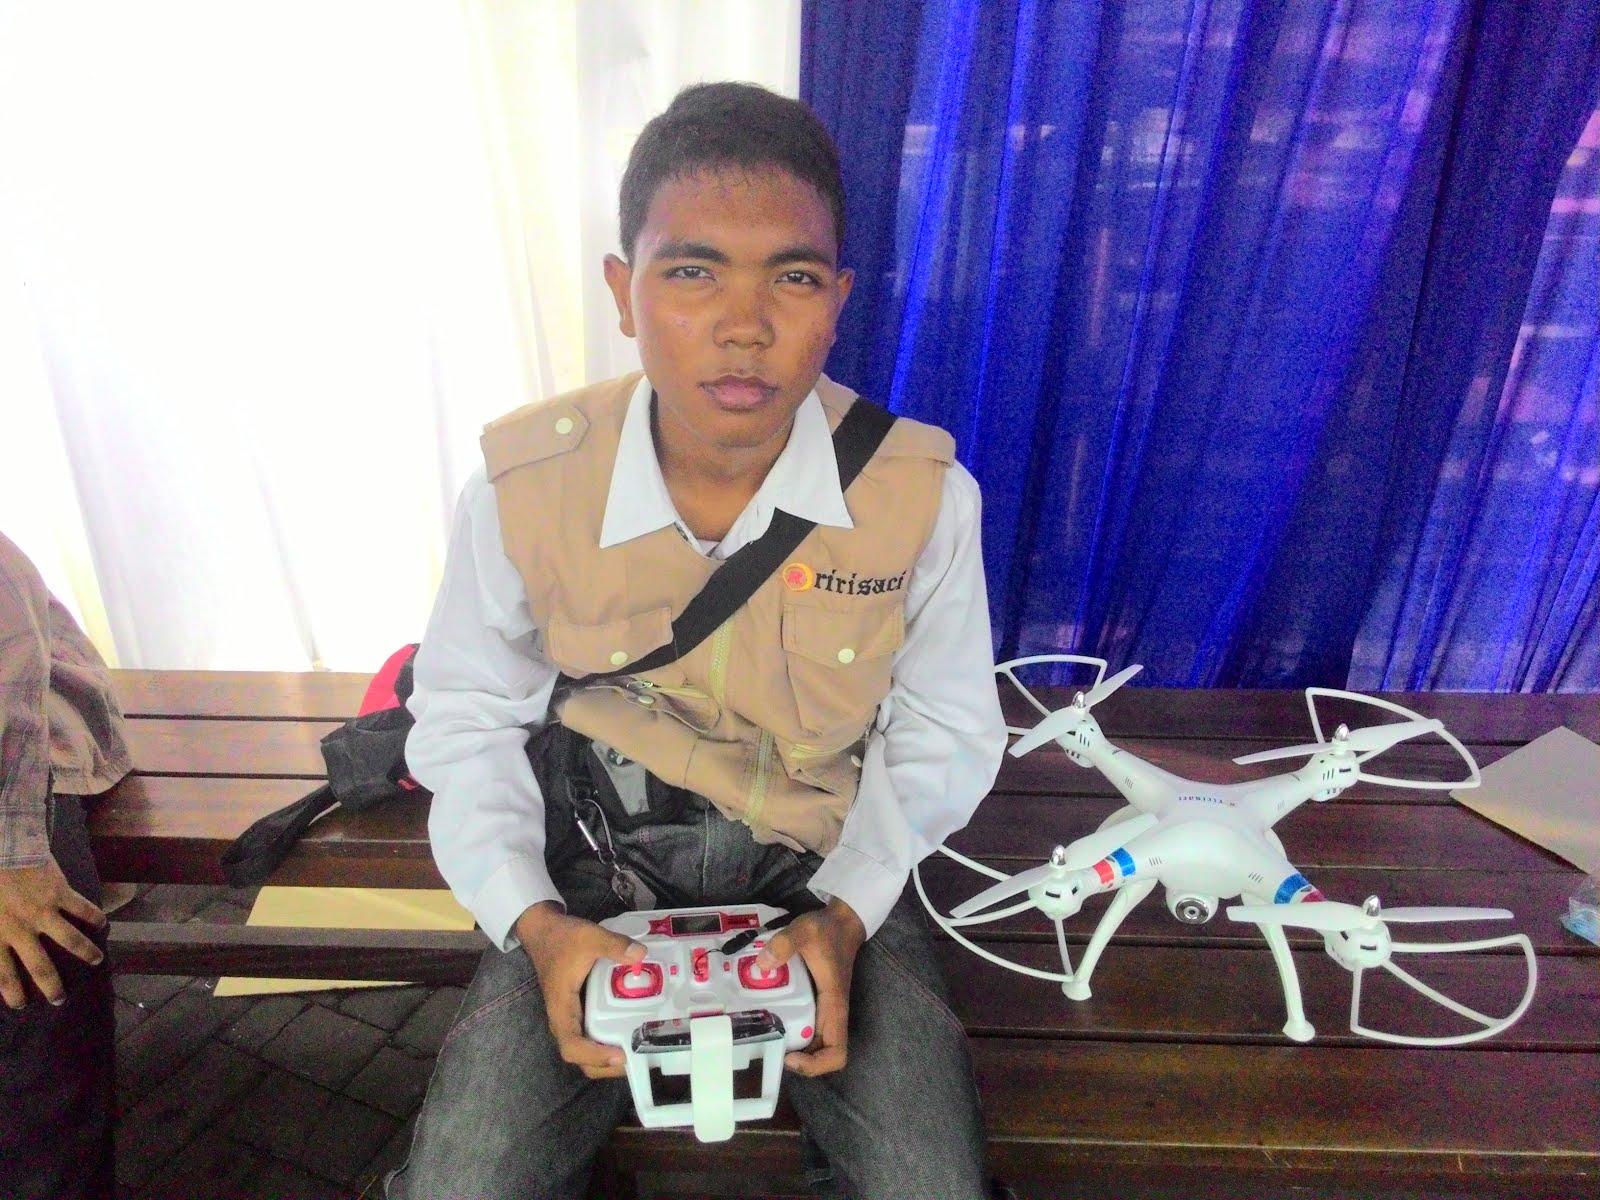 drone dji vr  | 600 x 344